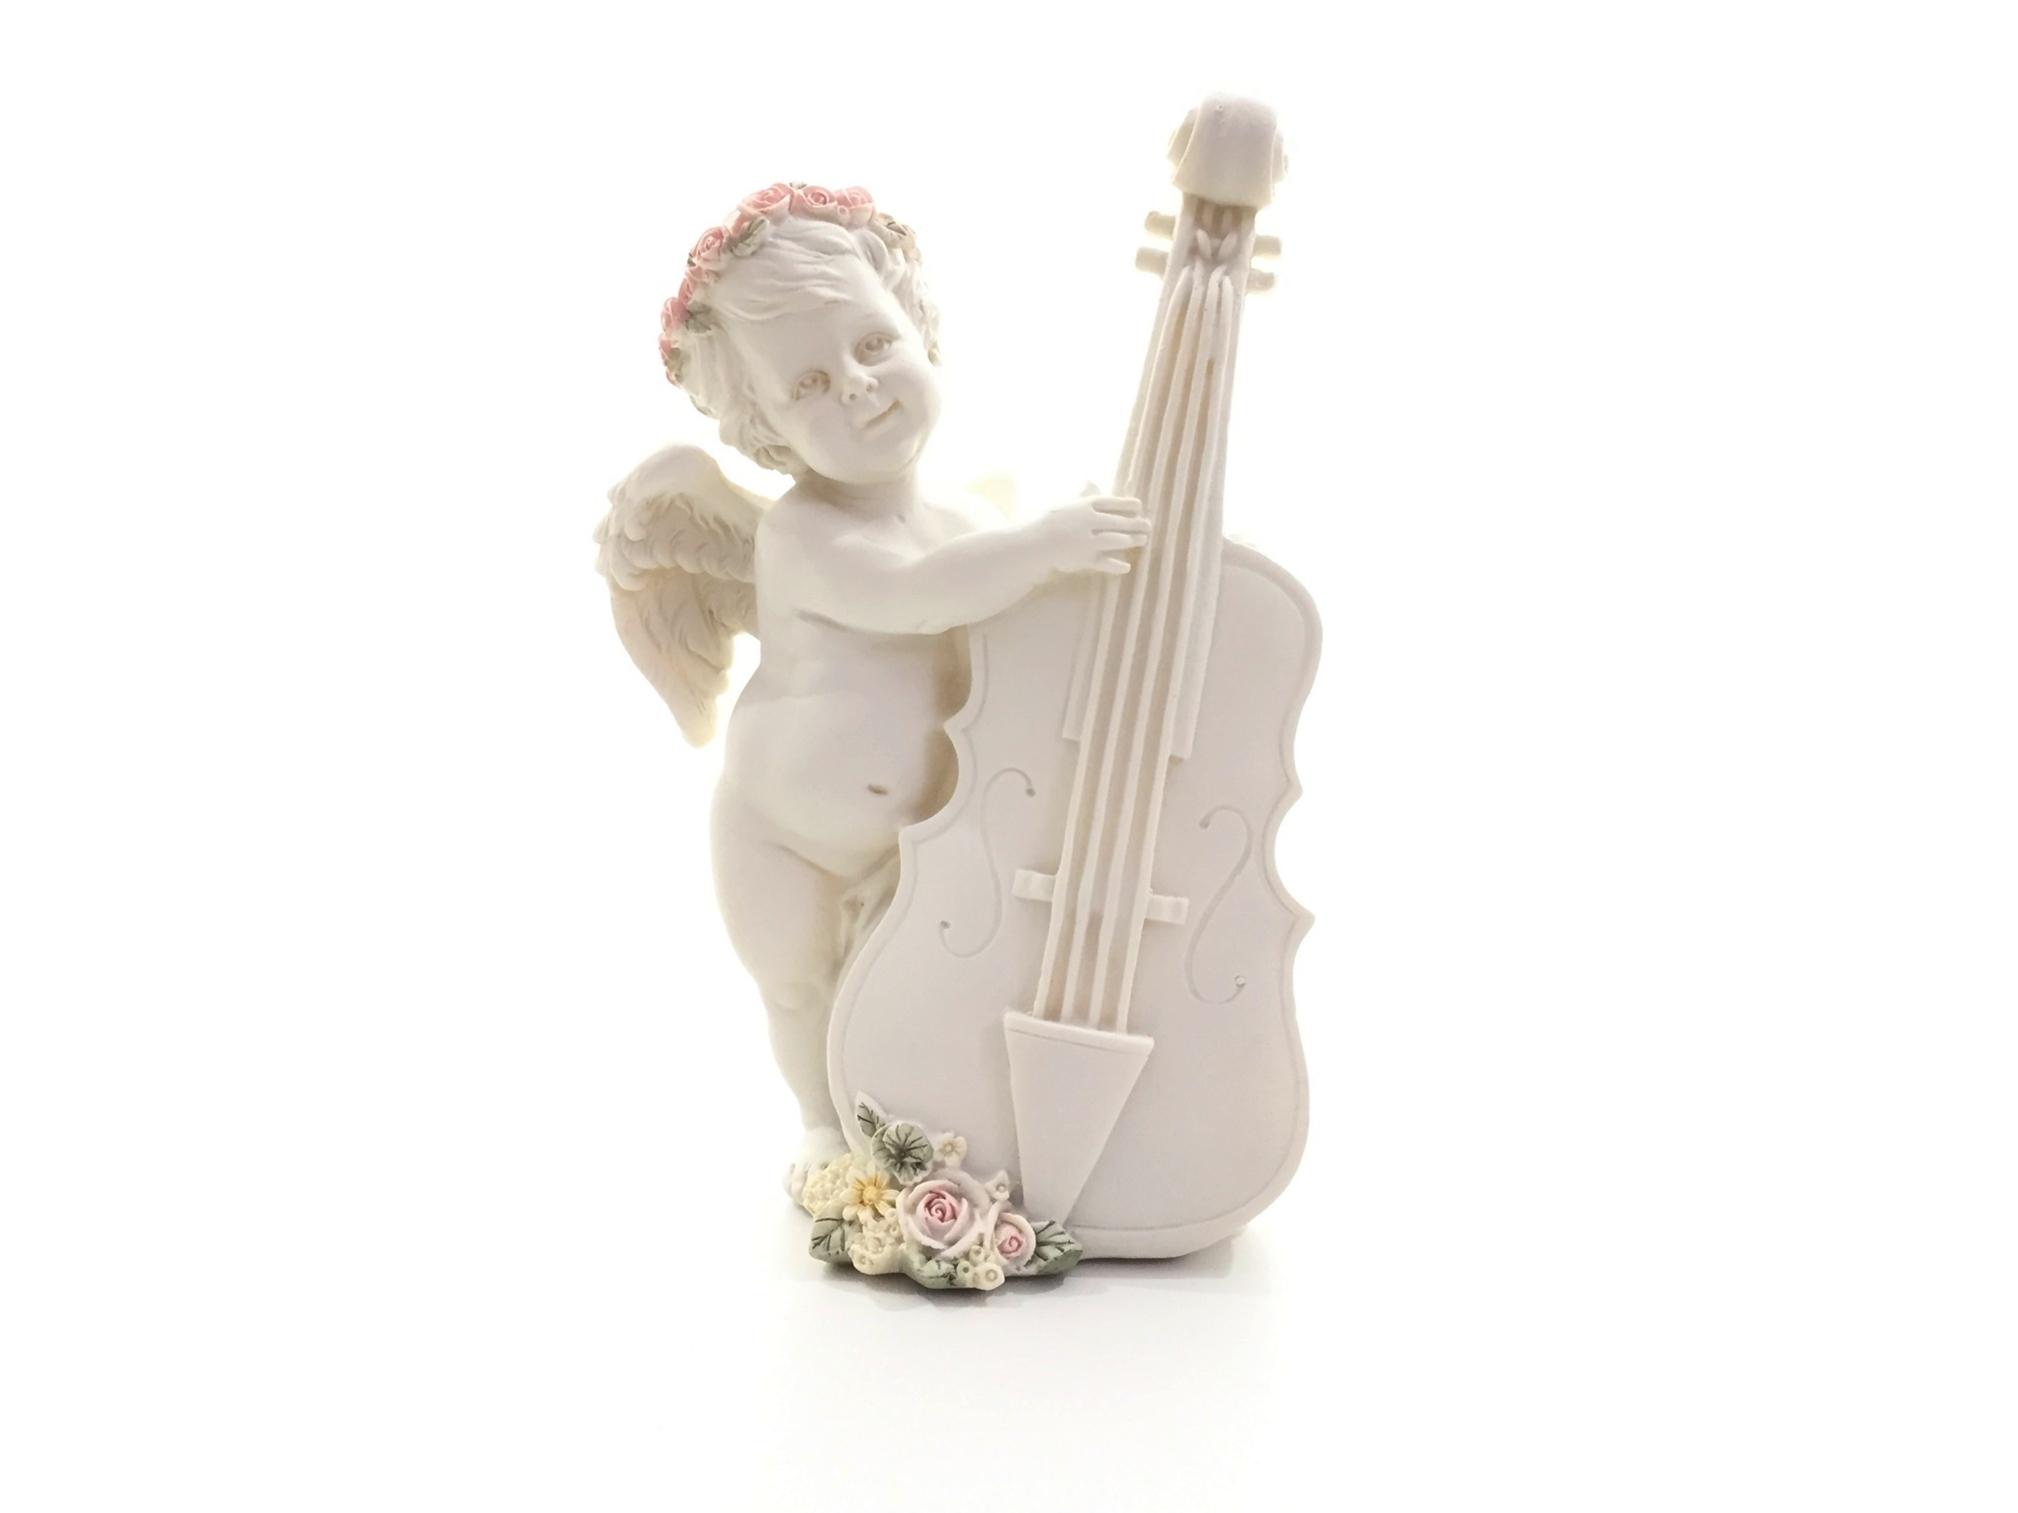 Figurine Ange Musicien Violoncelle